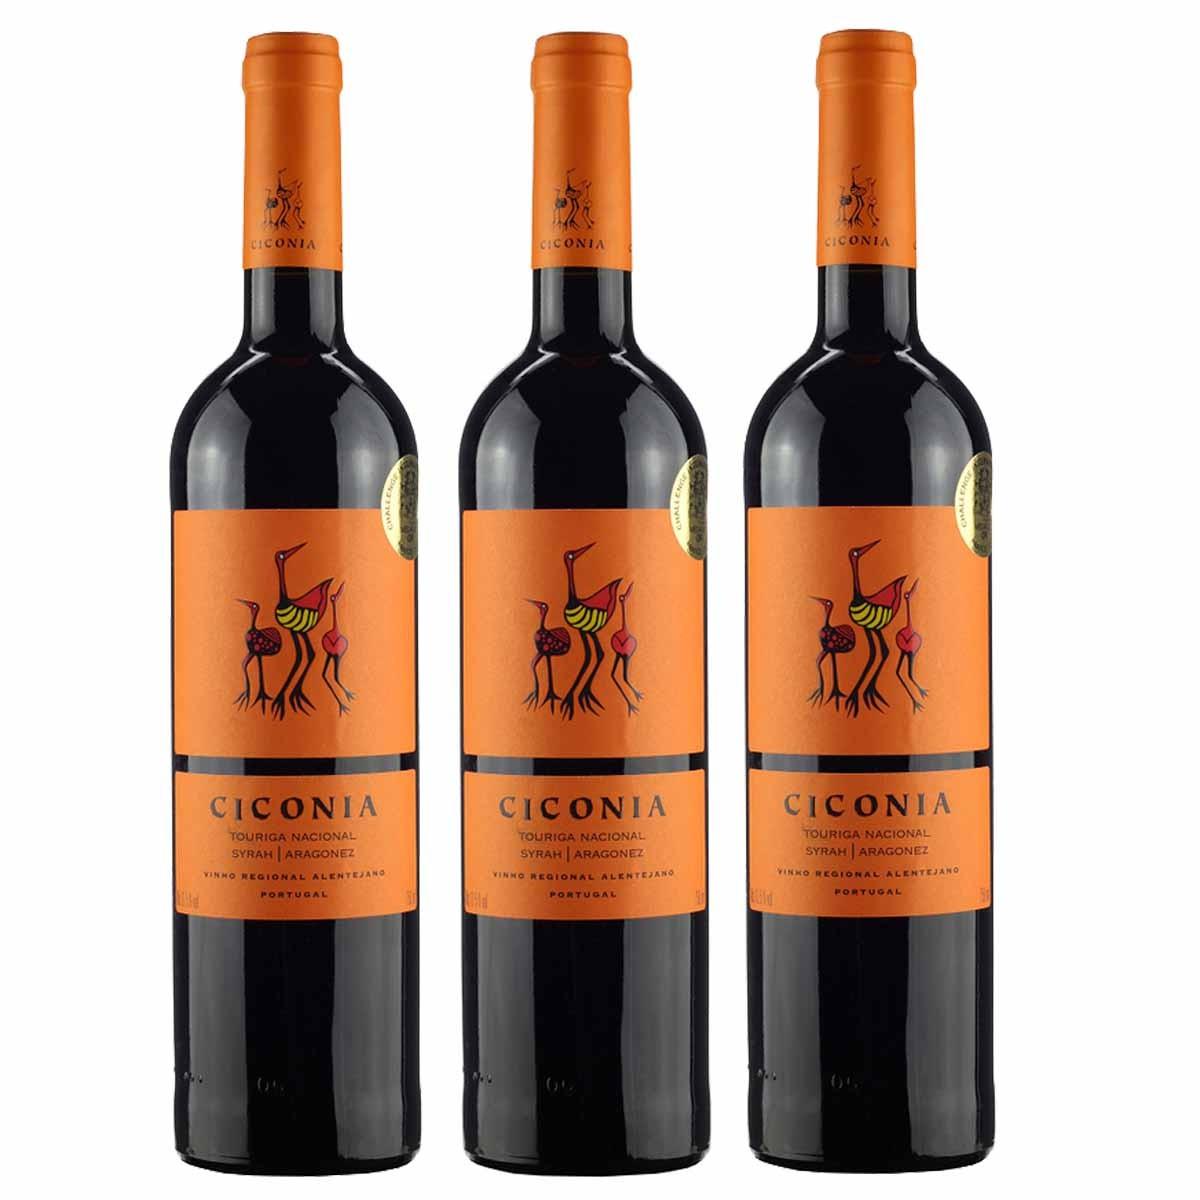 Kit 3x Vinho Tinto Português Ciconia Regional Alentejano